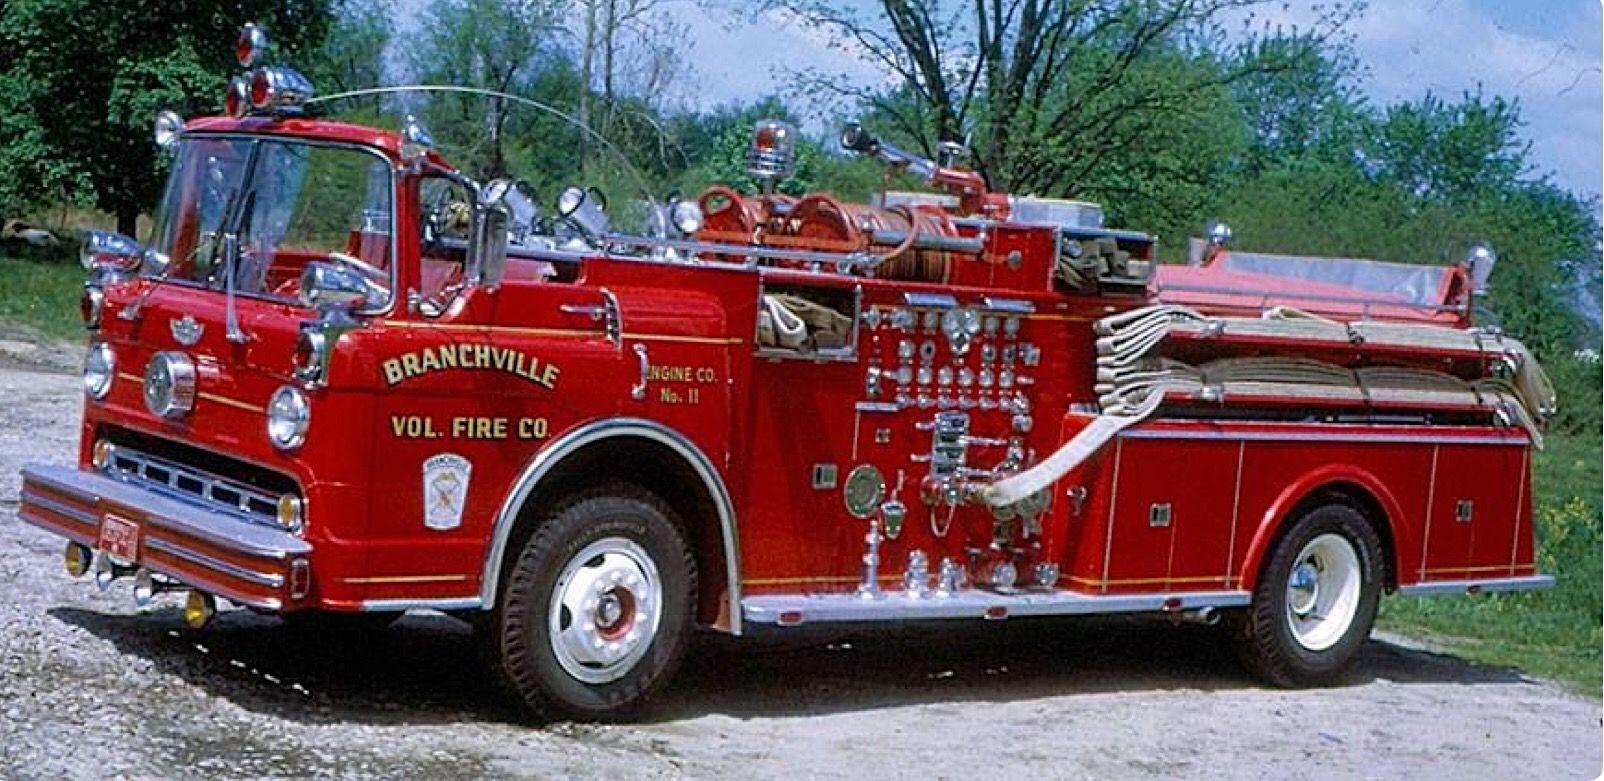 Branchville Volunteer Fire Co. College Park, Maryland, USA